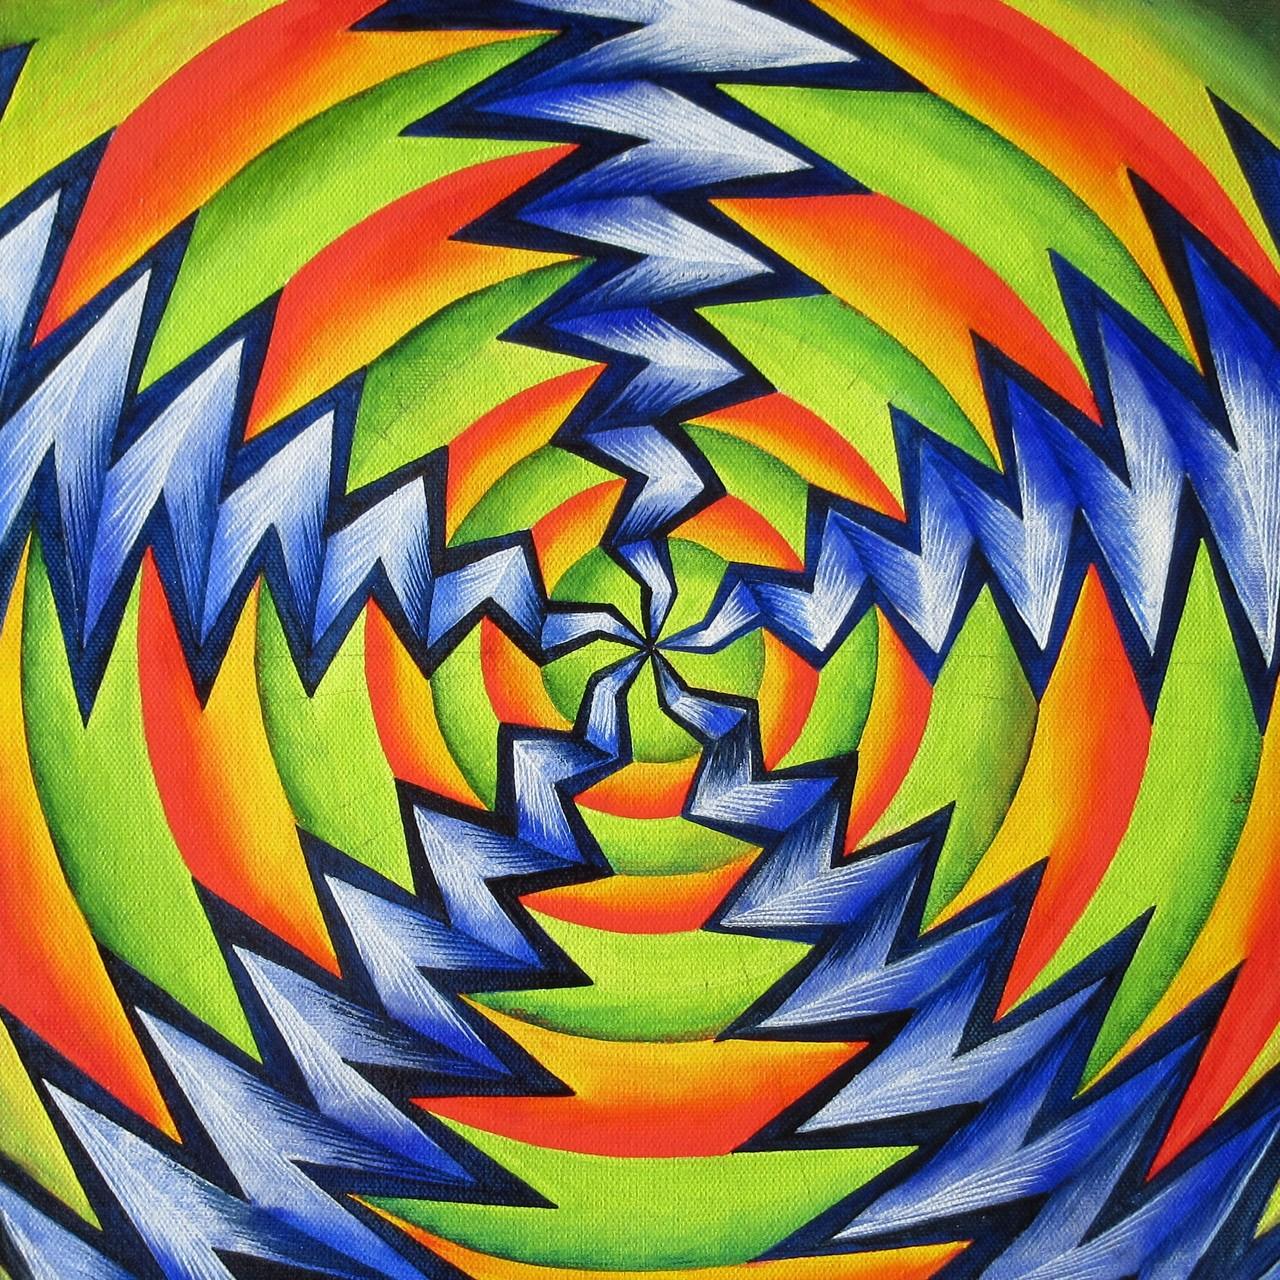 """Creation II"", oil on canvas 12x12, February 2015"